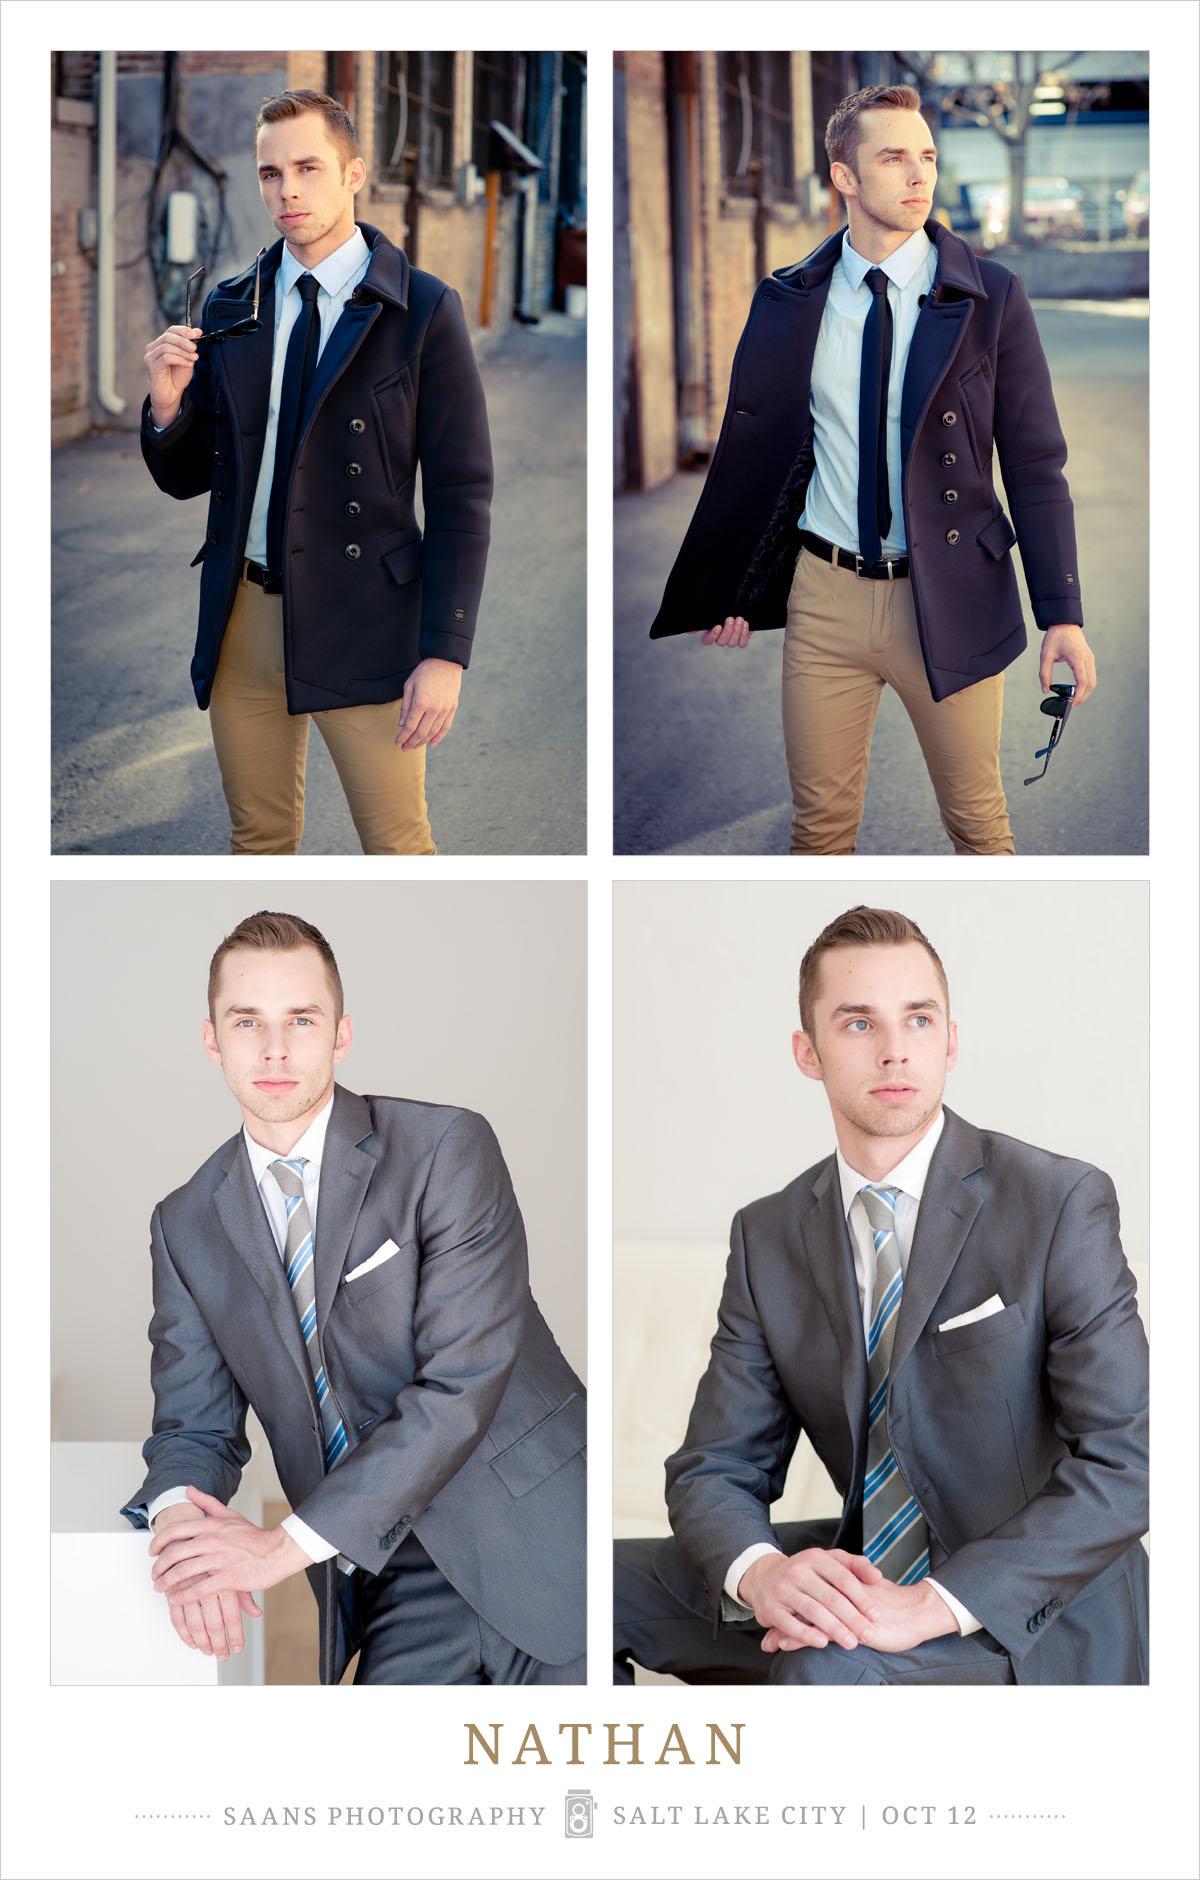 Nathan Portrait